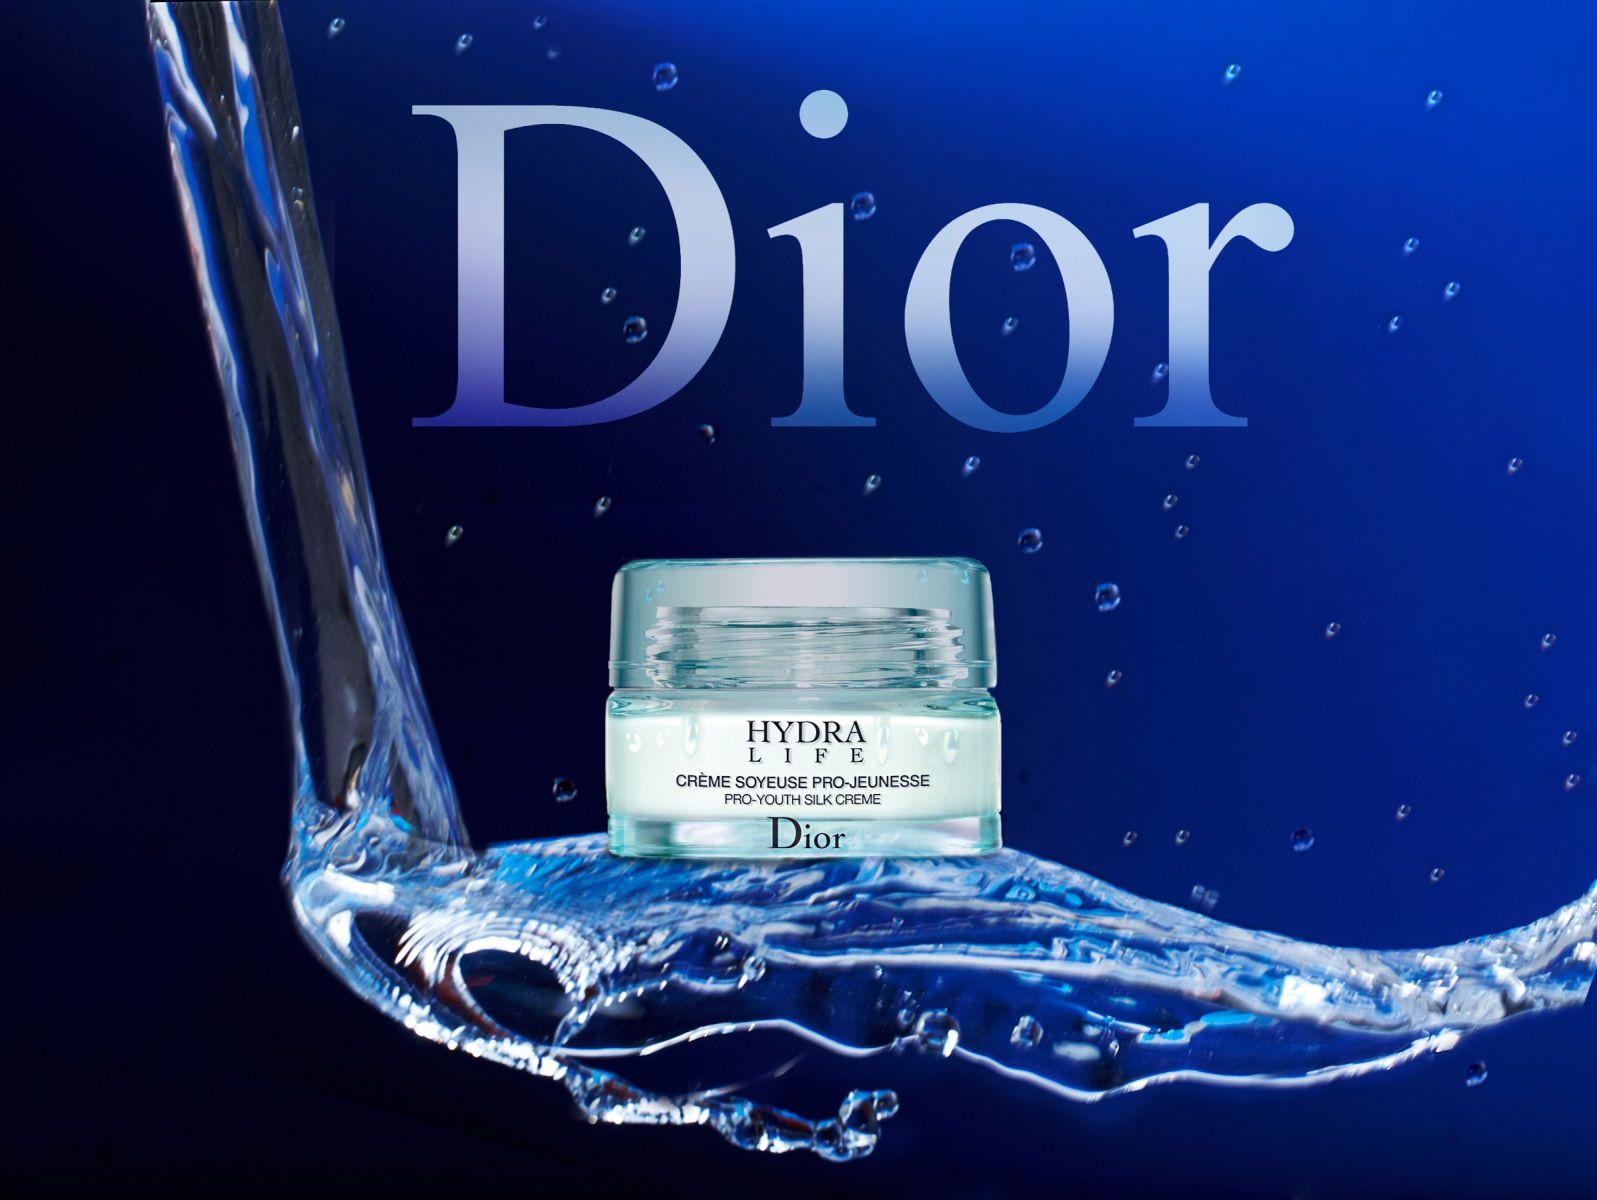 1diorhydralife_splash_0016r2.jpg